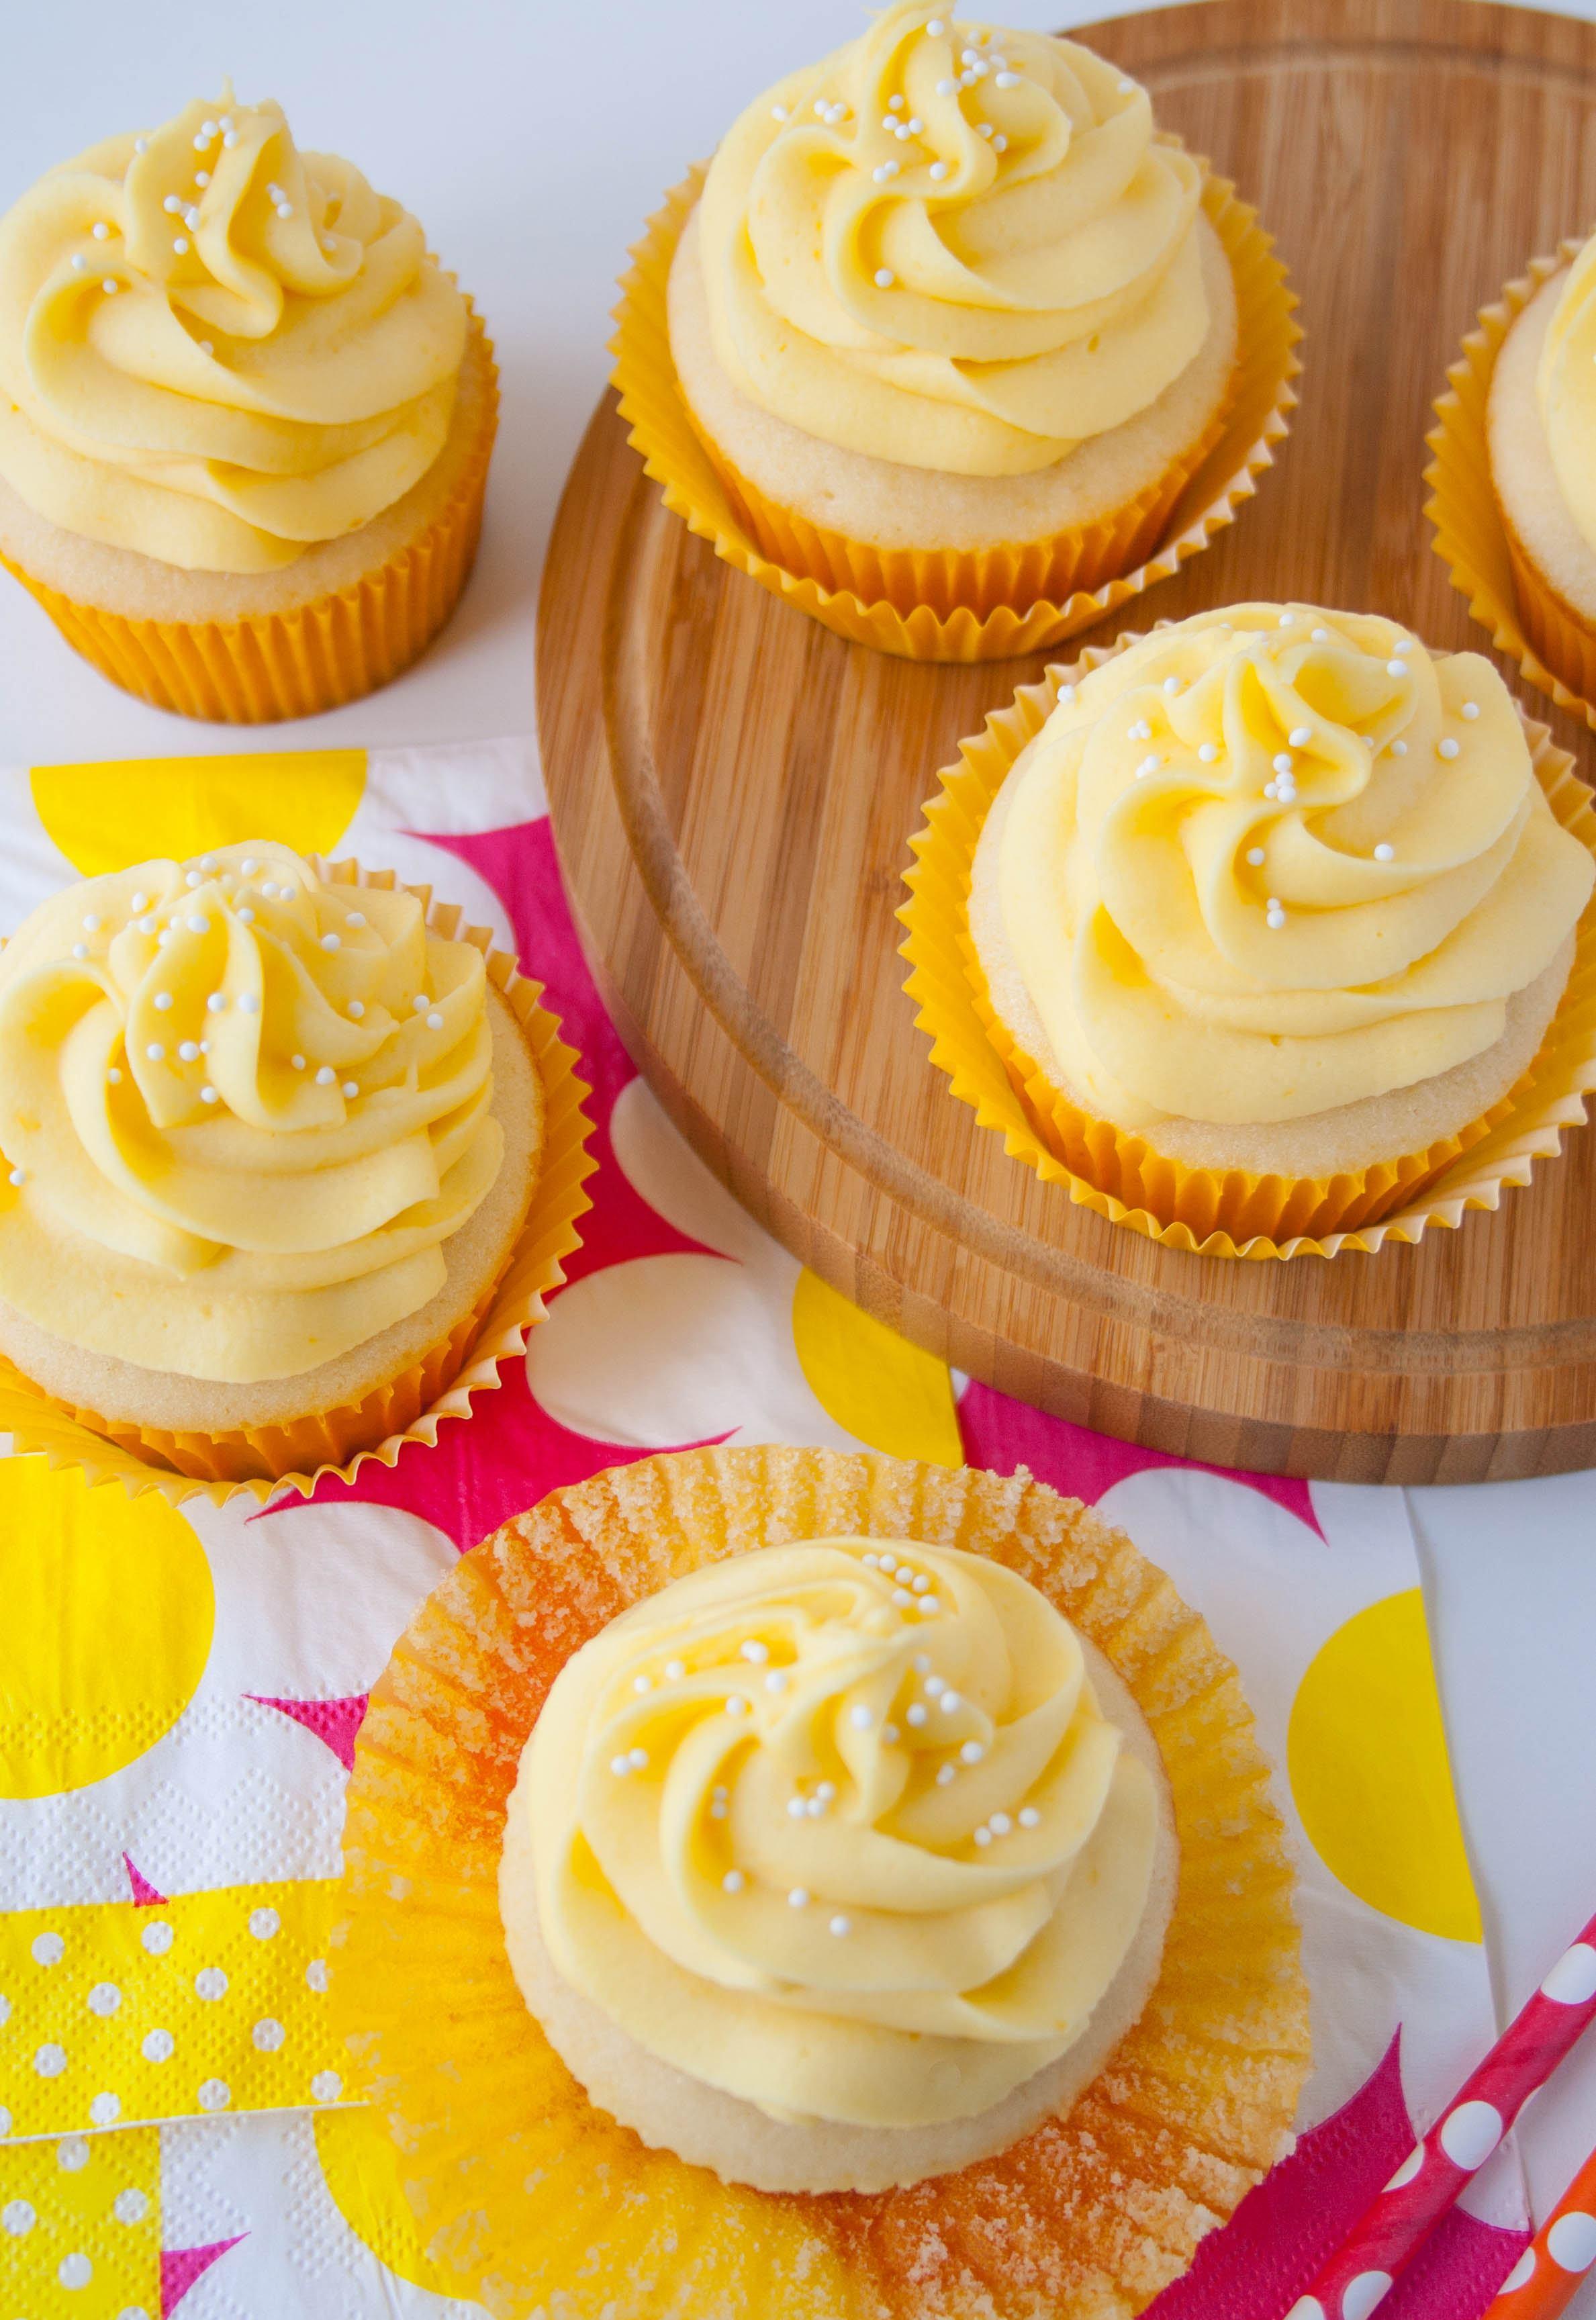 tropical-mango-vanilla-cupcakes-4.jpg